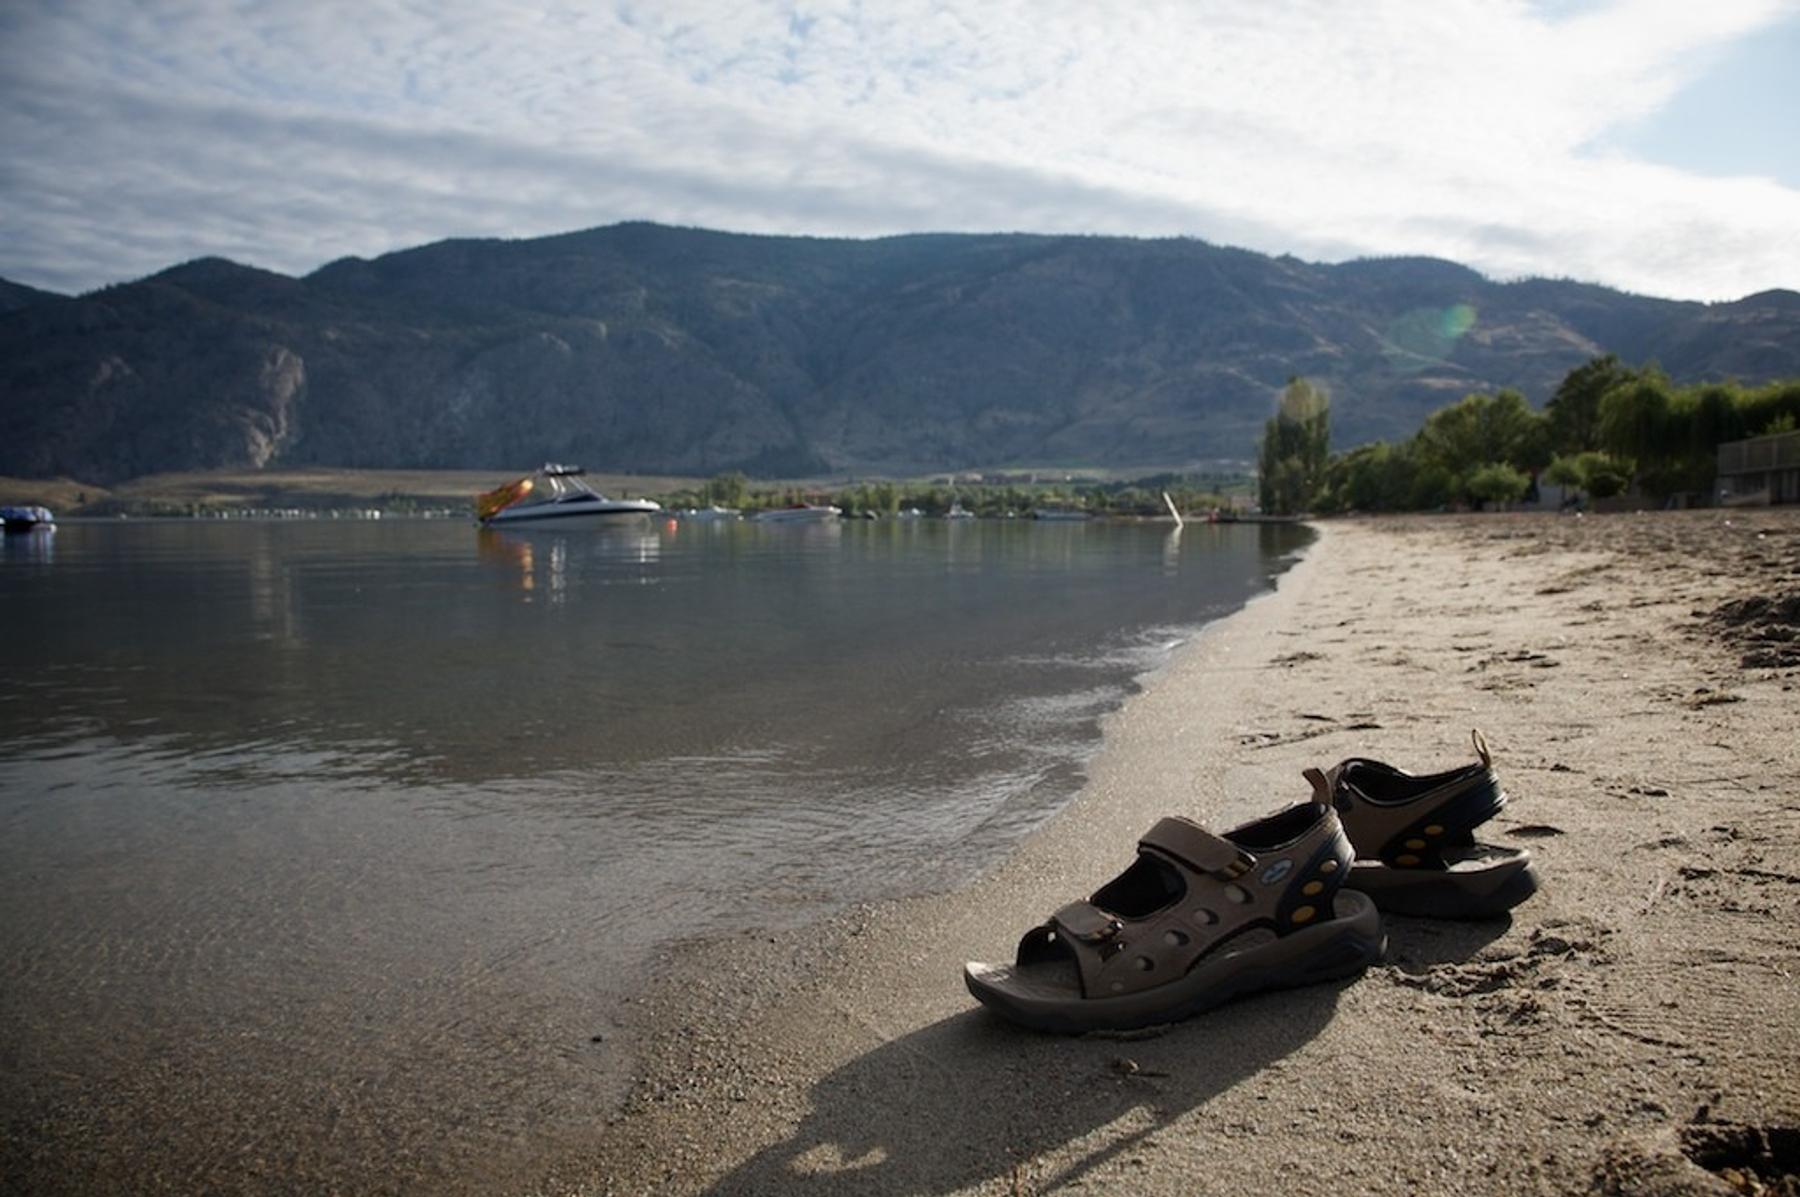 Beachfront daytime with sandals